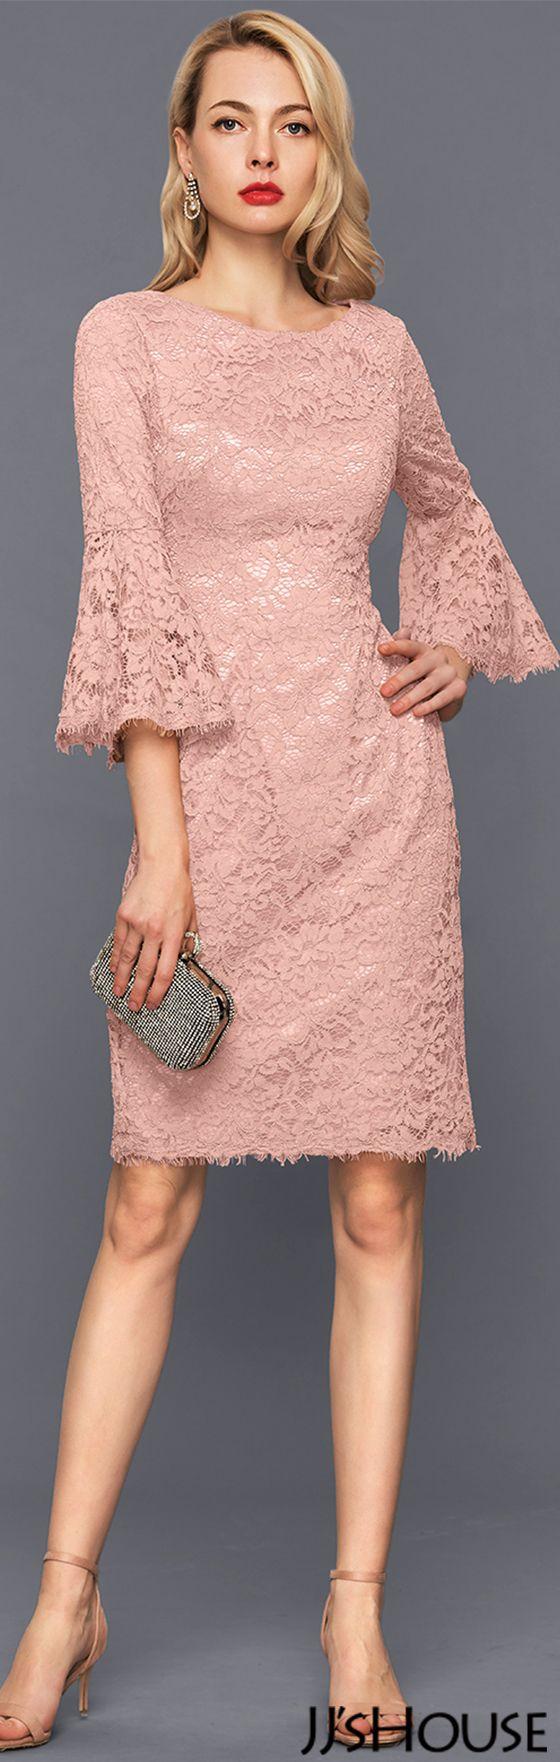 Sheath/Column Scoop Neck Knee-Length Lace Cocktail Dress#JJsHouse ...